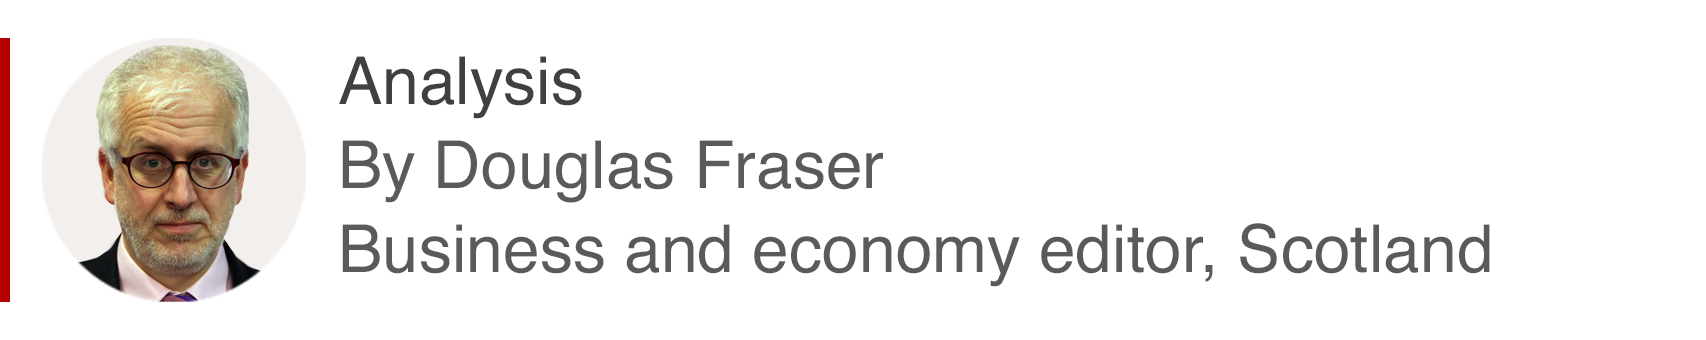 Analysis box by Douglas Fraser, business and economy editor, Scotland